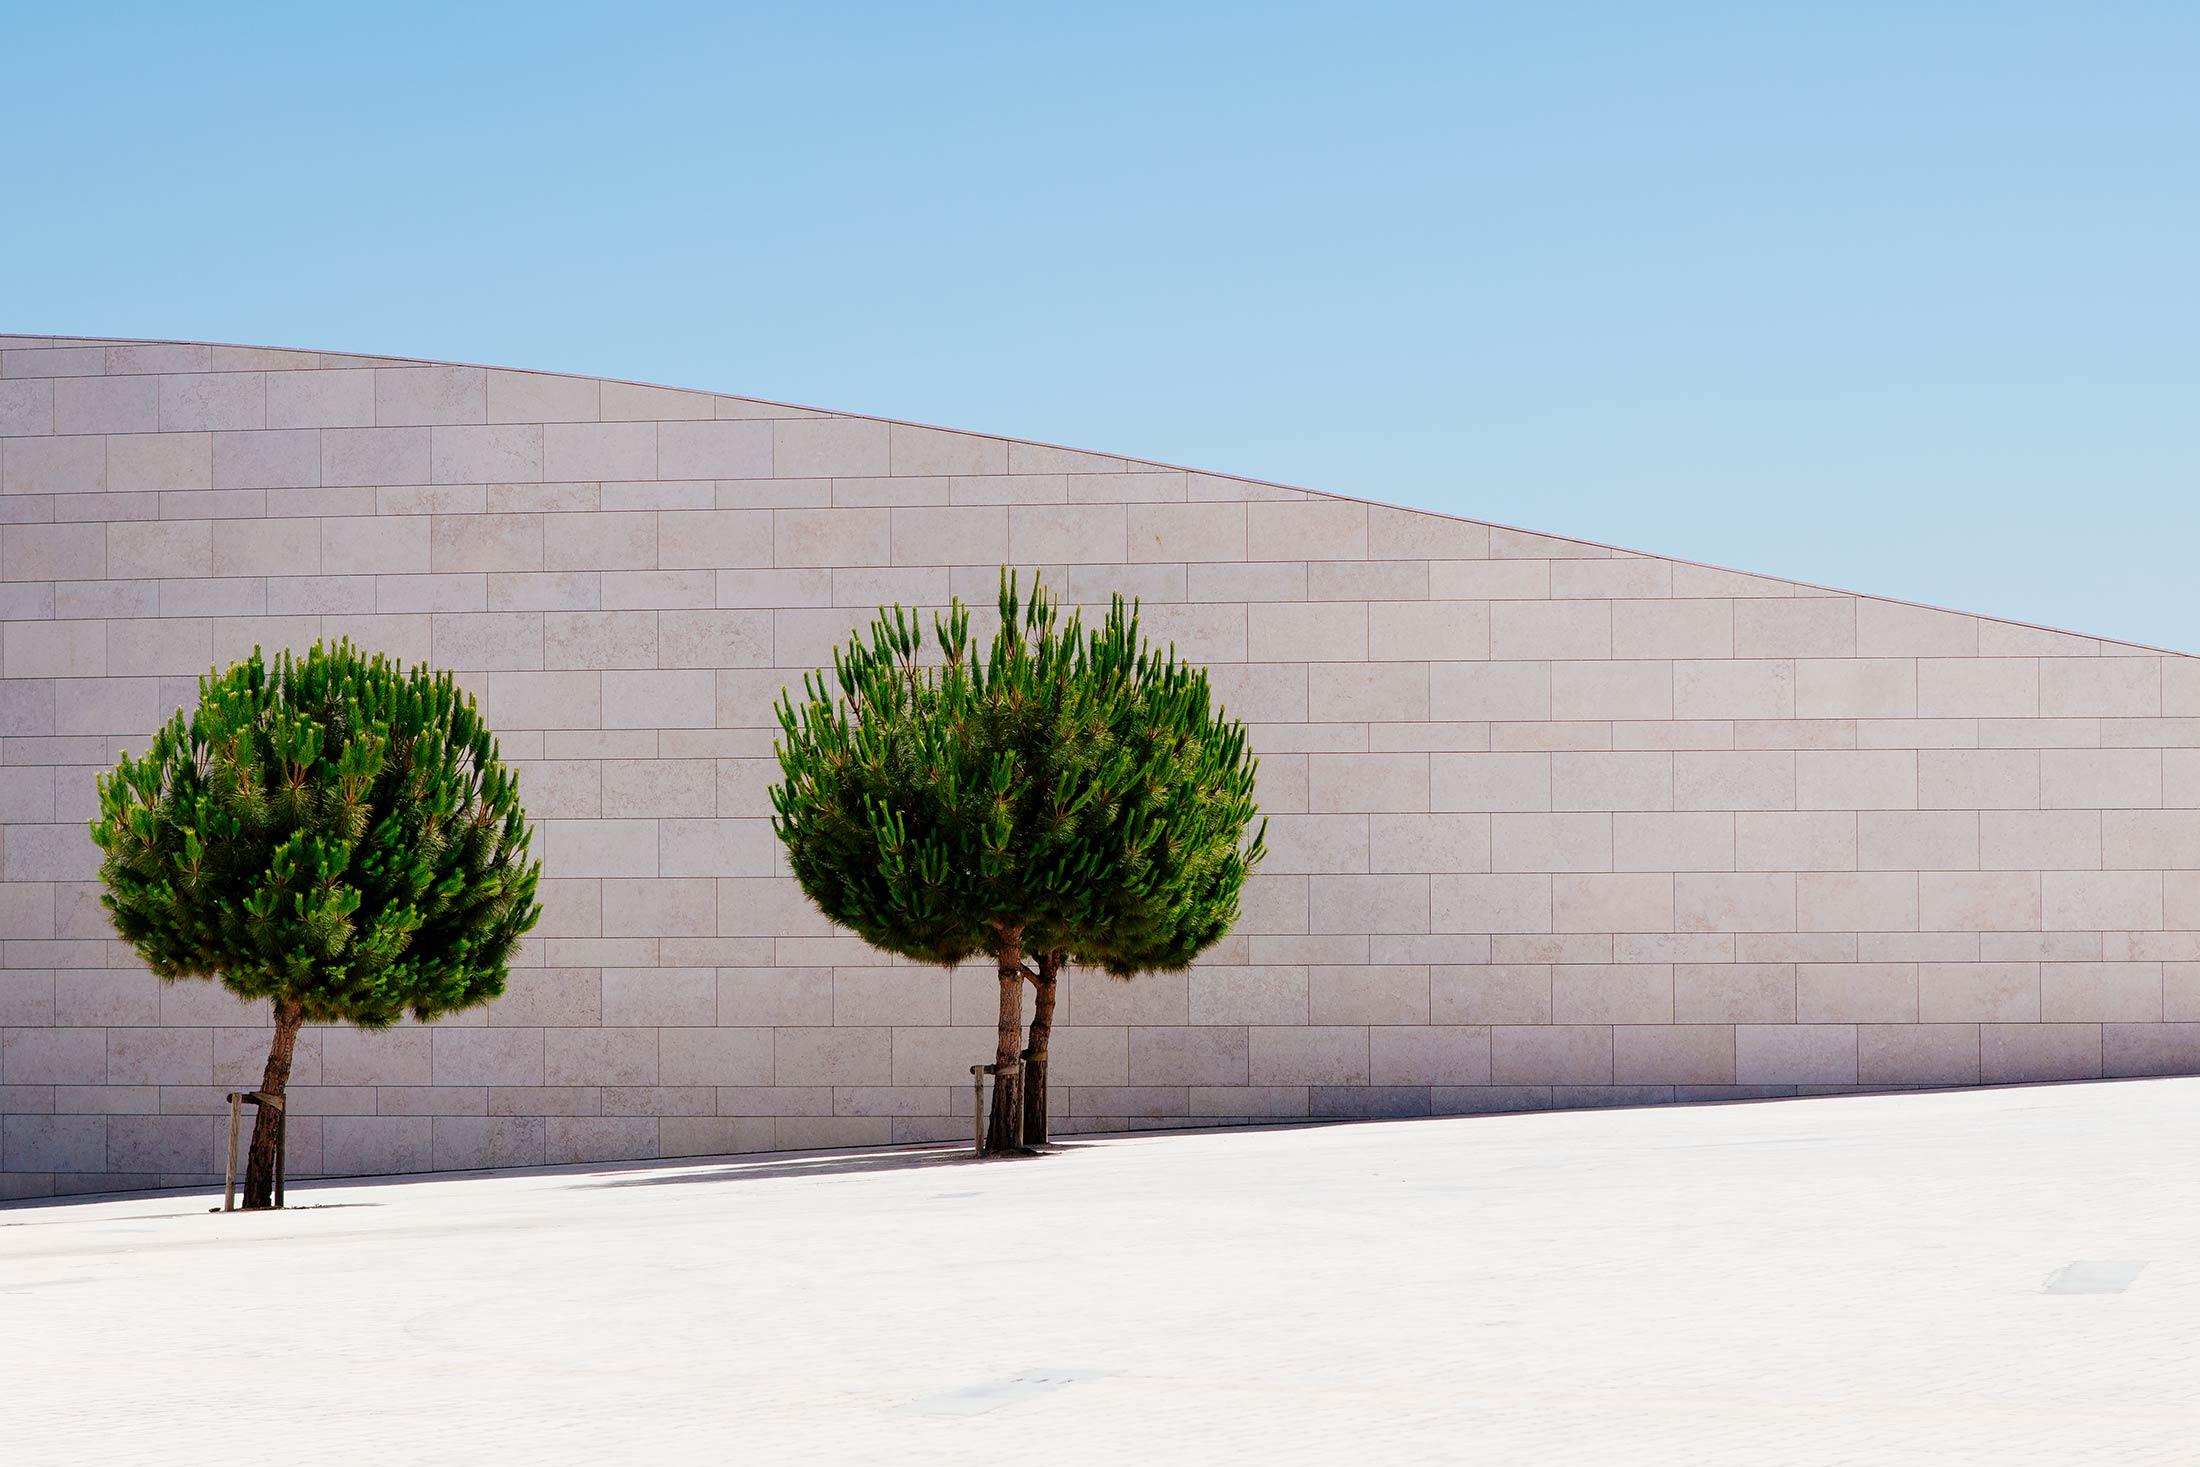 LIS_Lissabon_16-Mitja_Schneehage